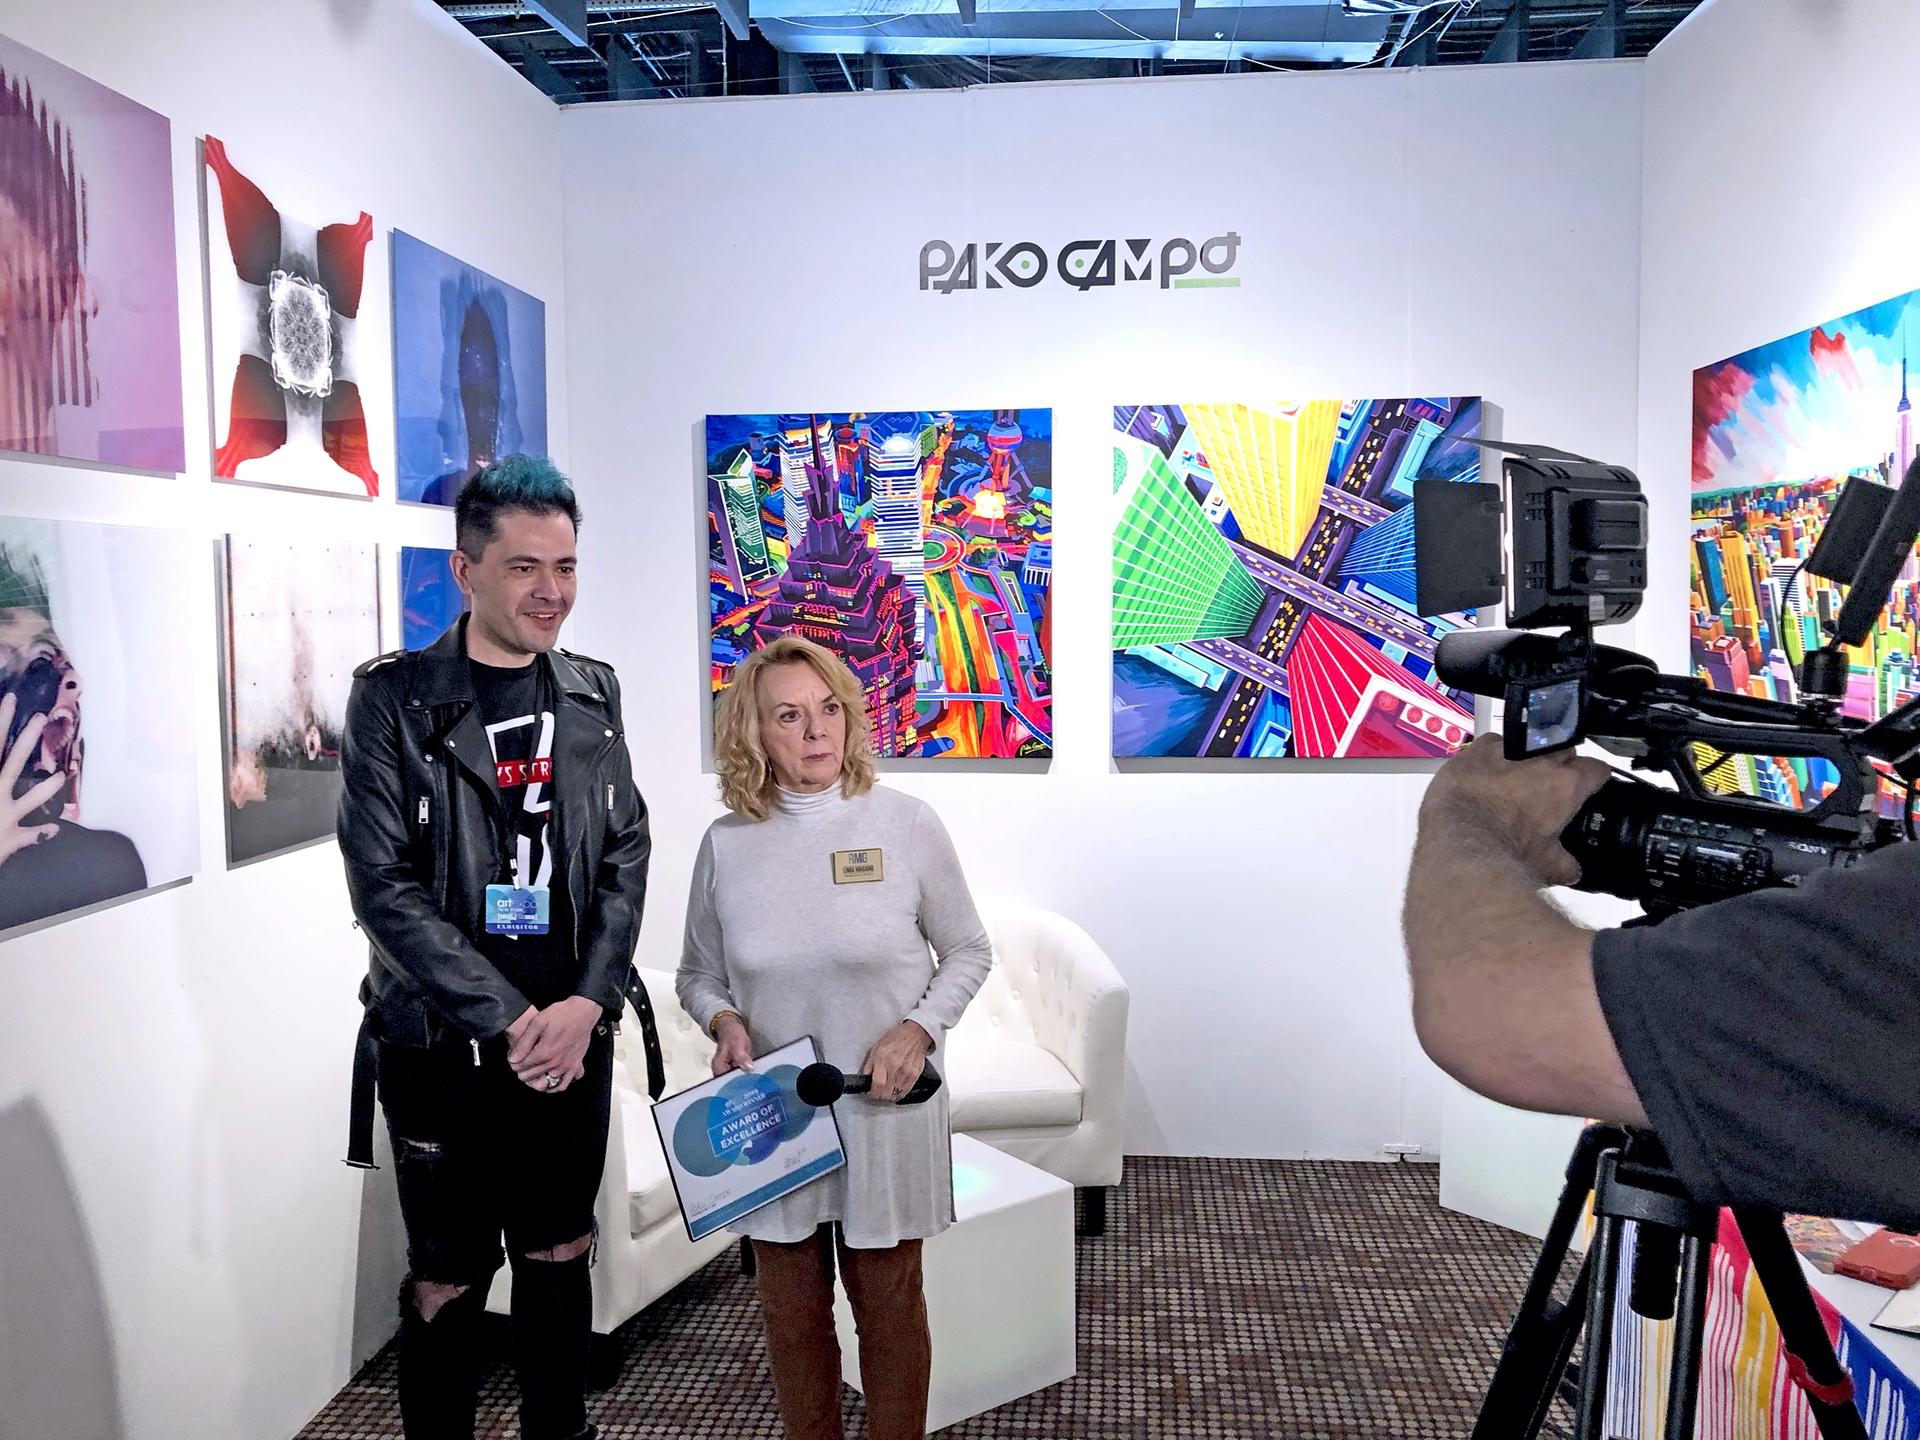 Last day of Artexpo New York 2019 02 by Pako Campo